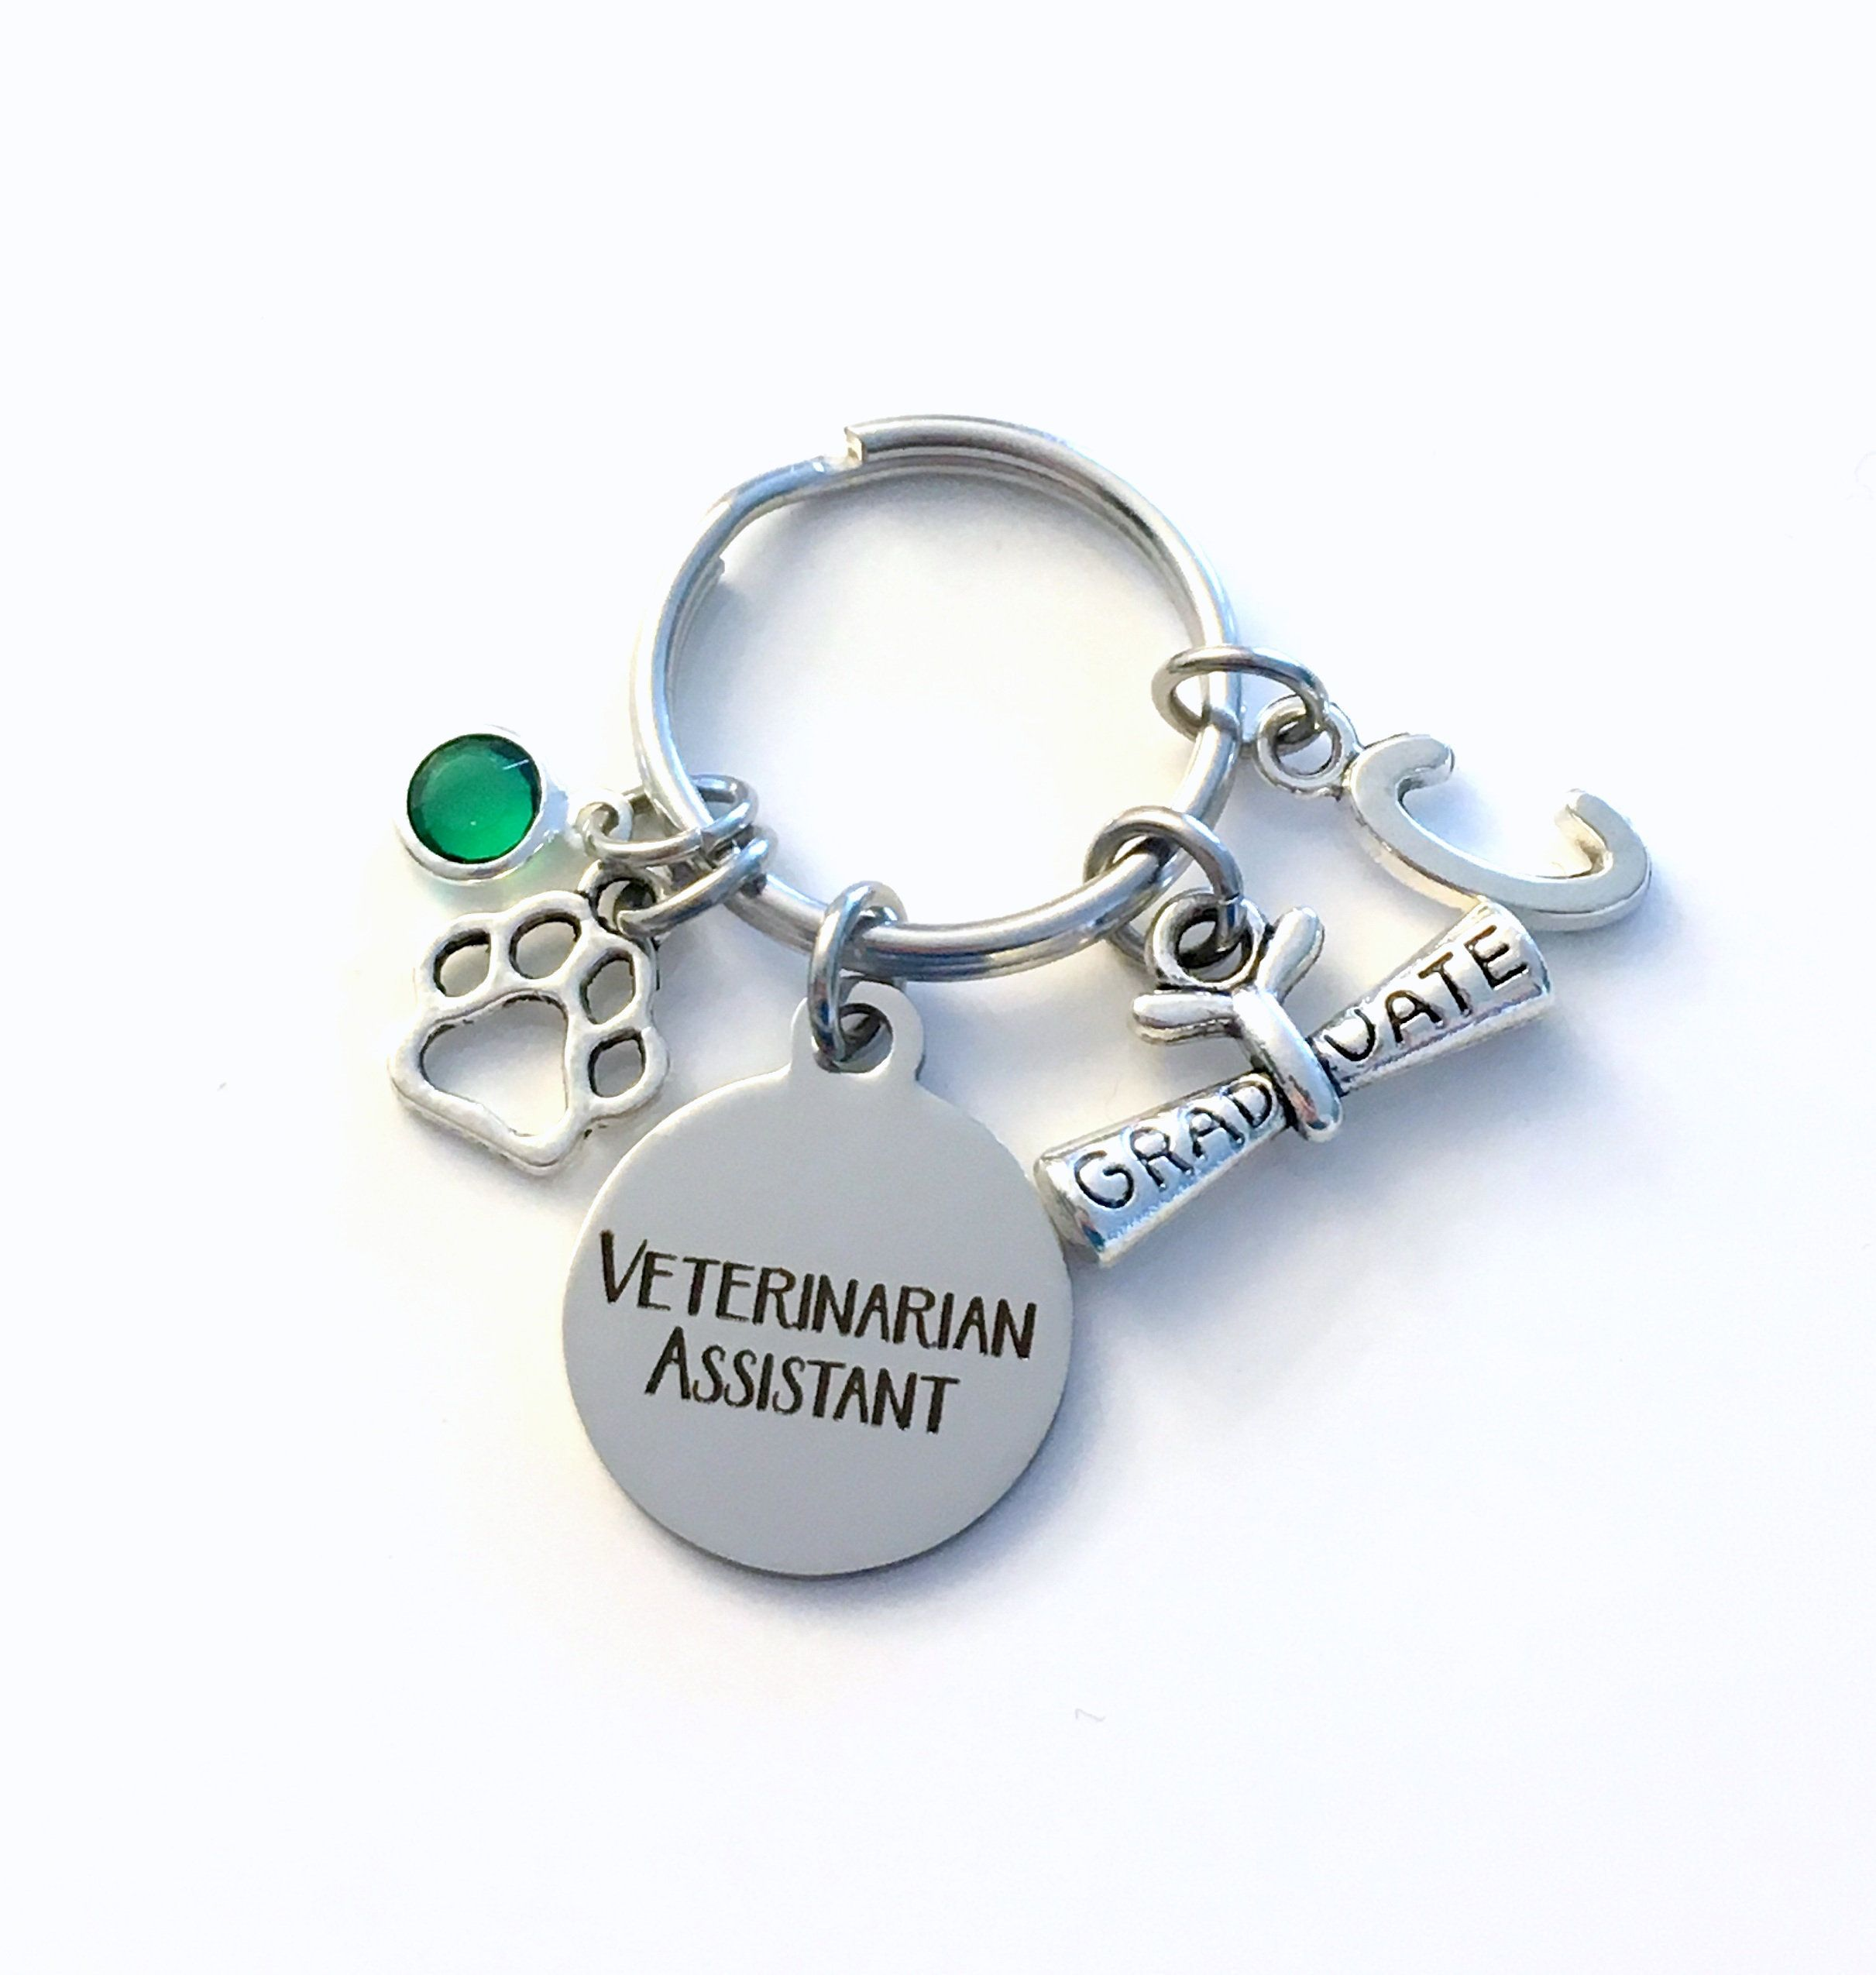 Graduation gift for veterinarian assistant keychain vet